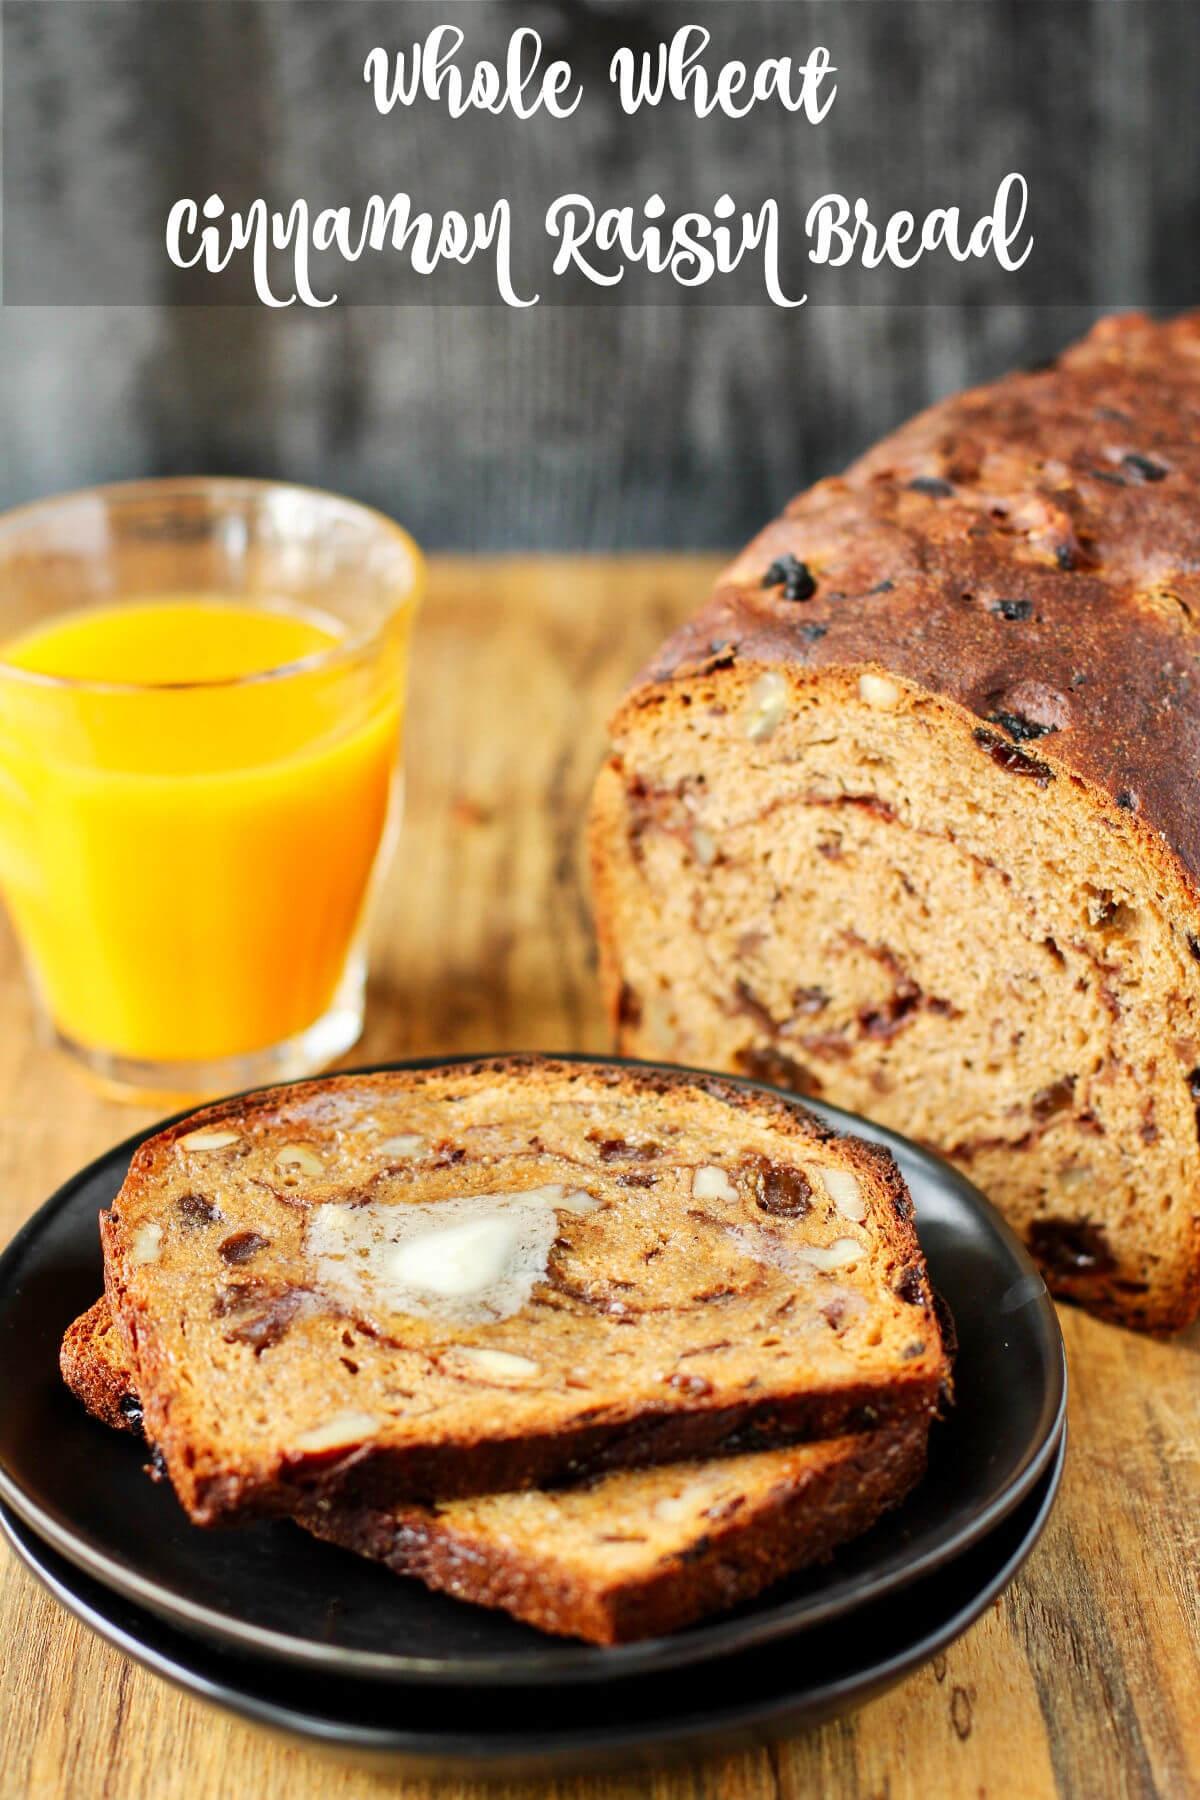 Whole Wheat Cinnamon Raisin Bread  on a plate